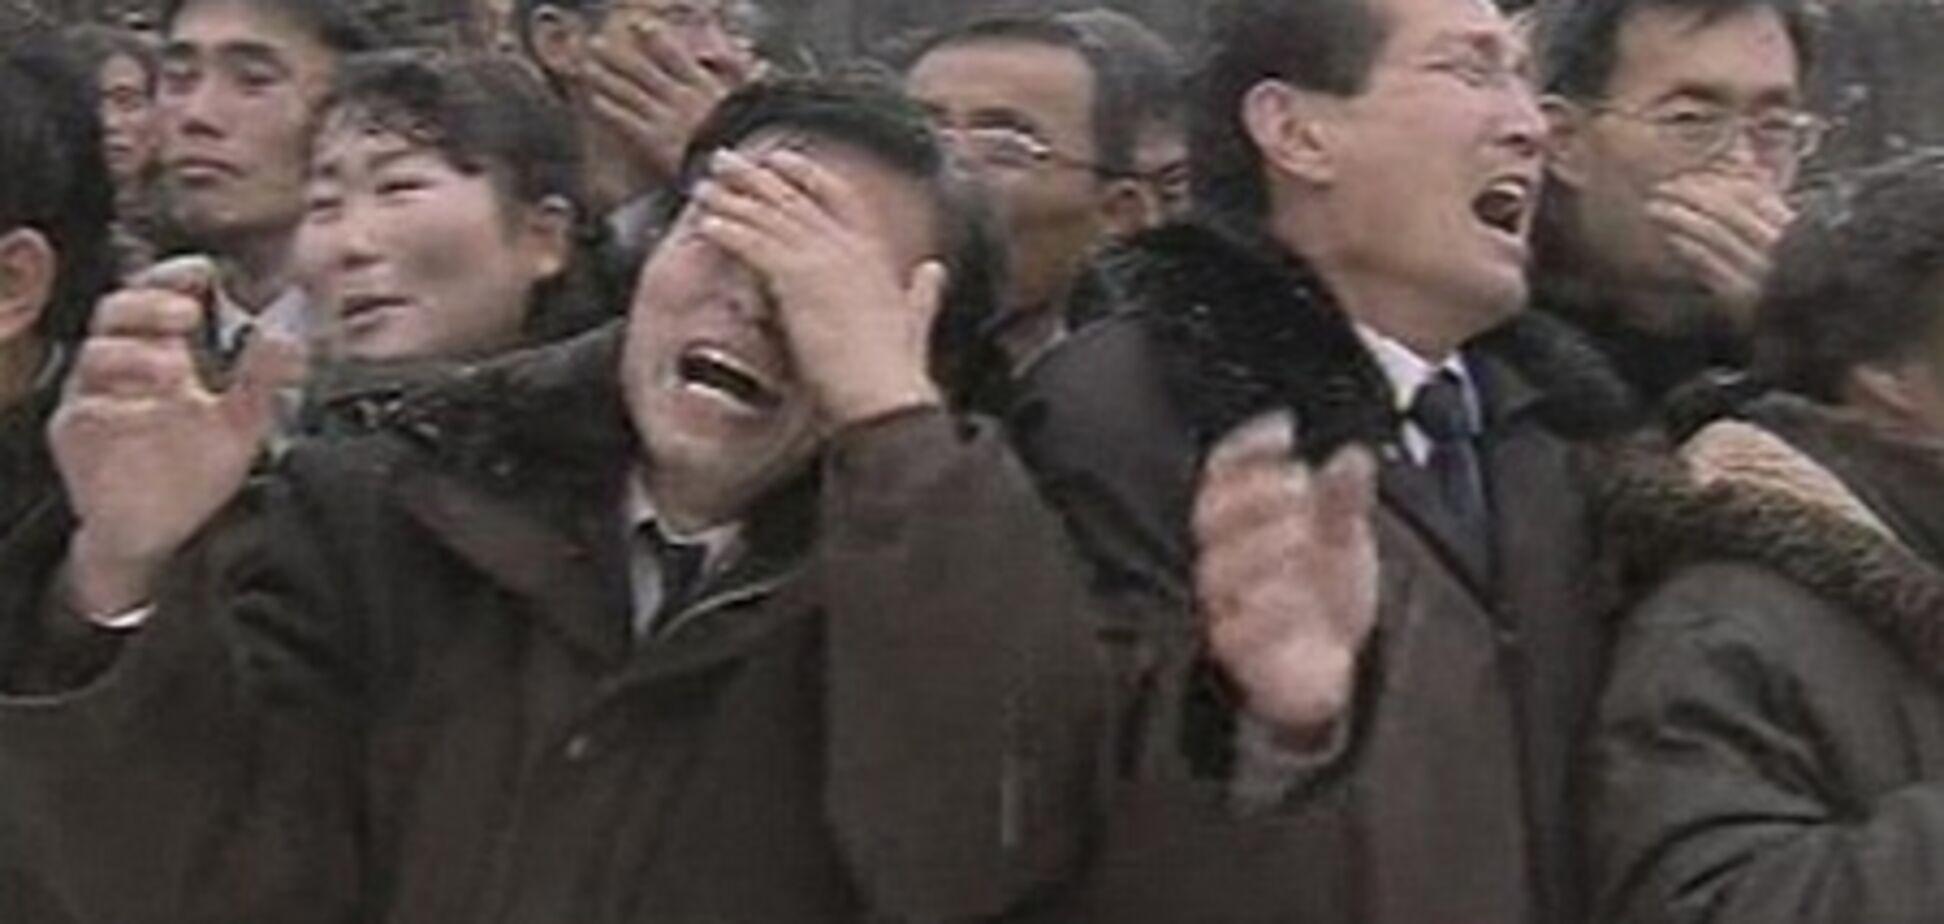 Жителям КНДР, не соблюдавшим траур по Ким Чен Иру, грозит полгода тюрьмы